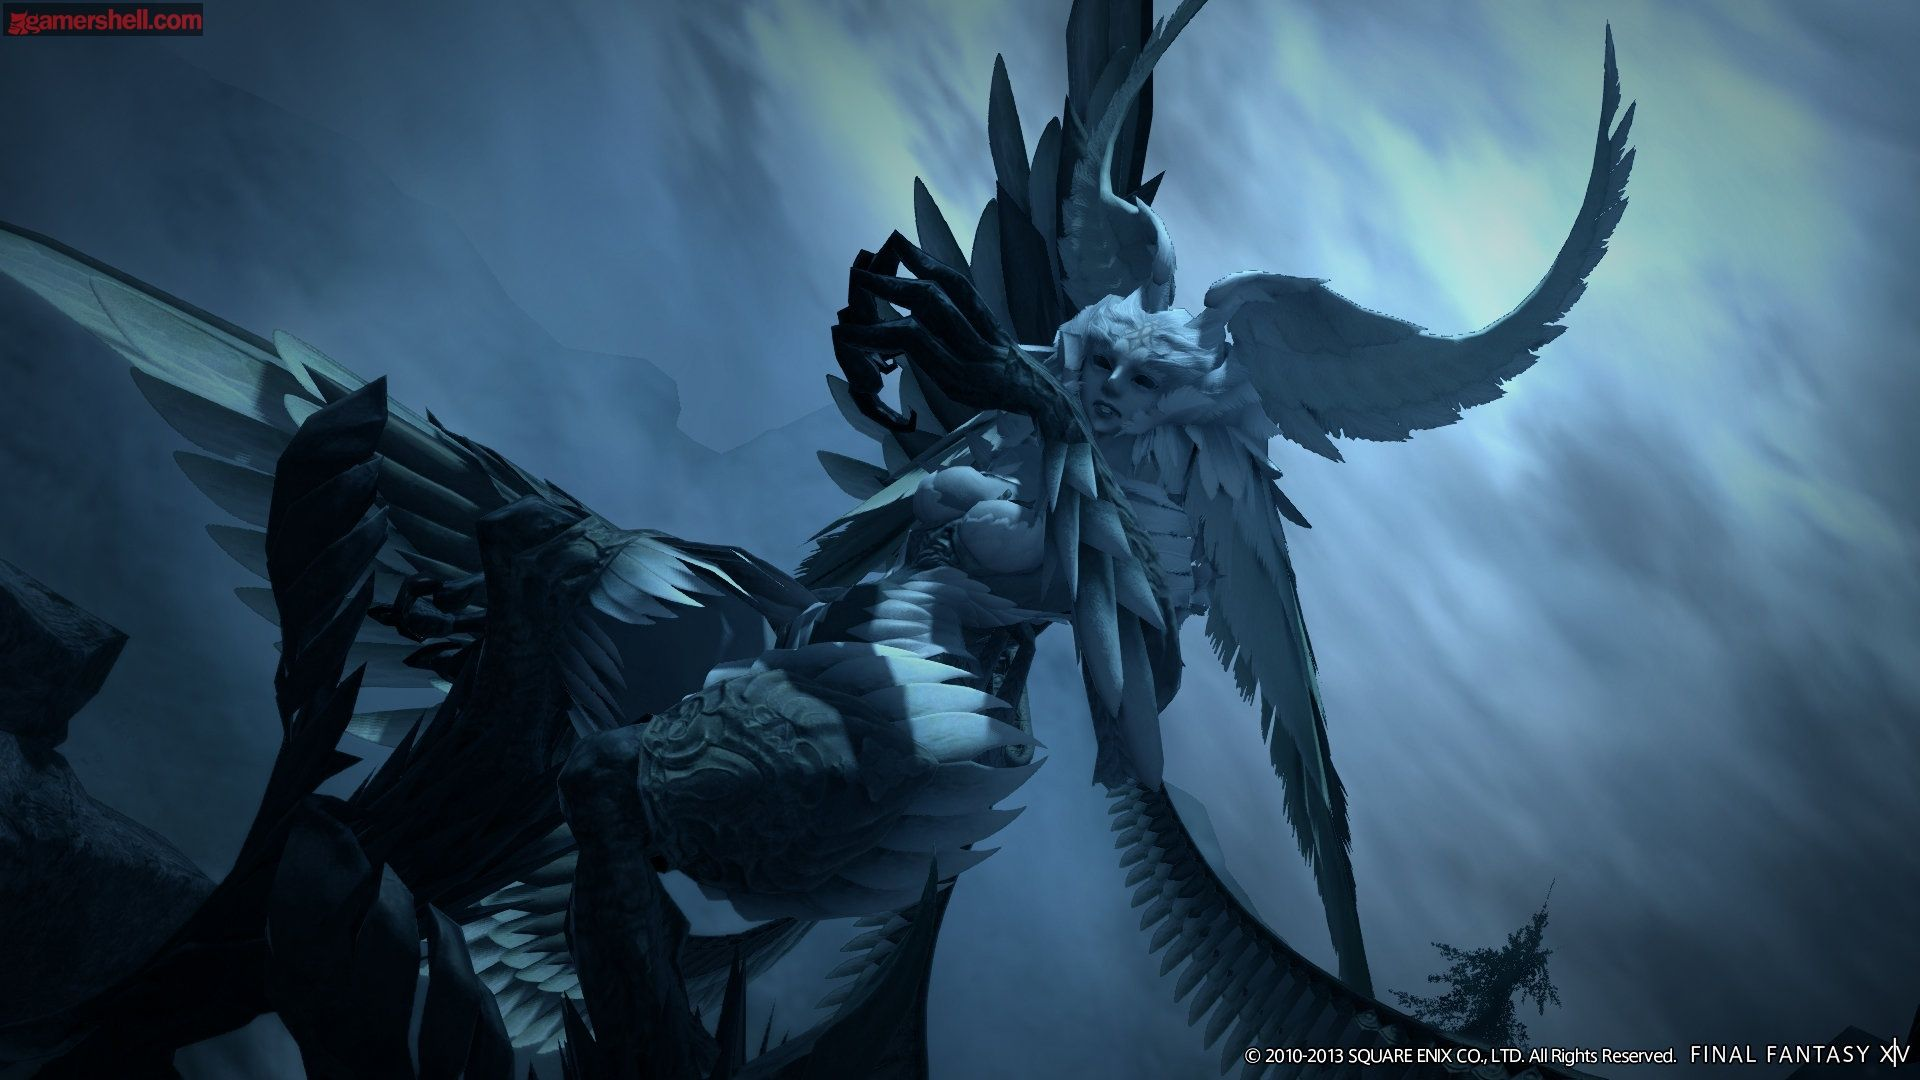 Final Fantasy Xiv A Realm Reborn Wallpaper WallDevil